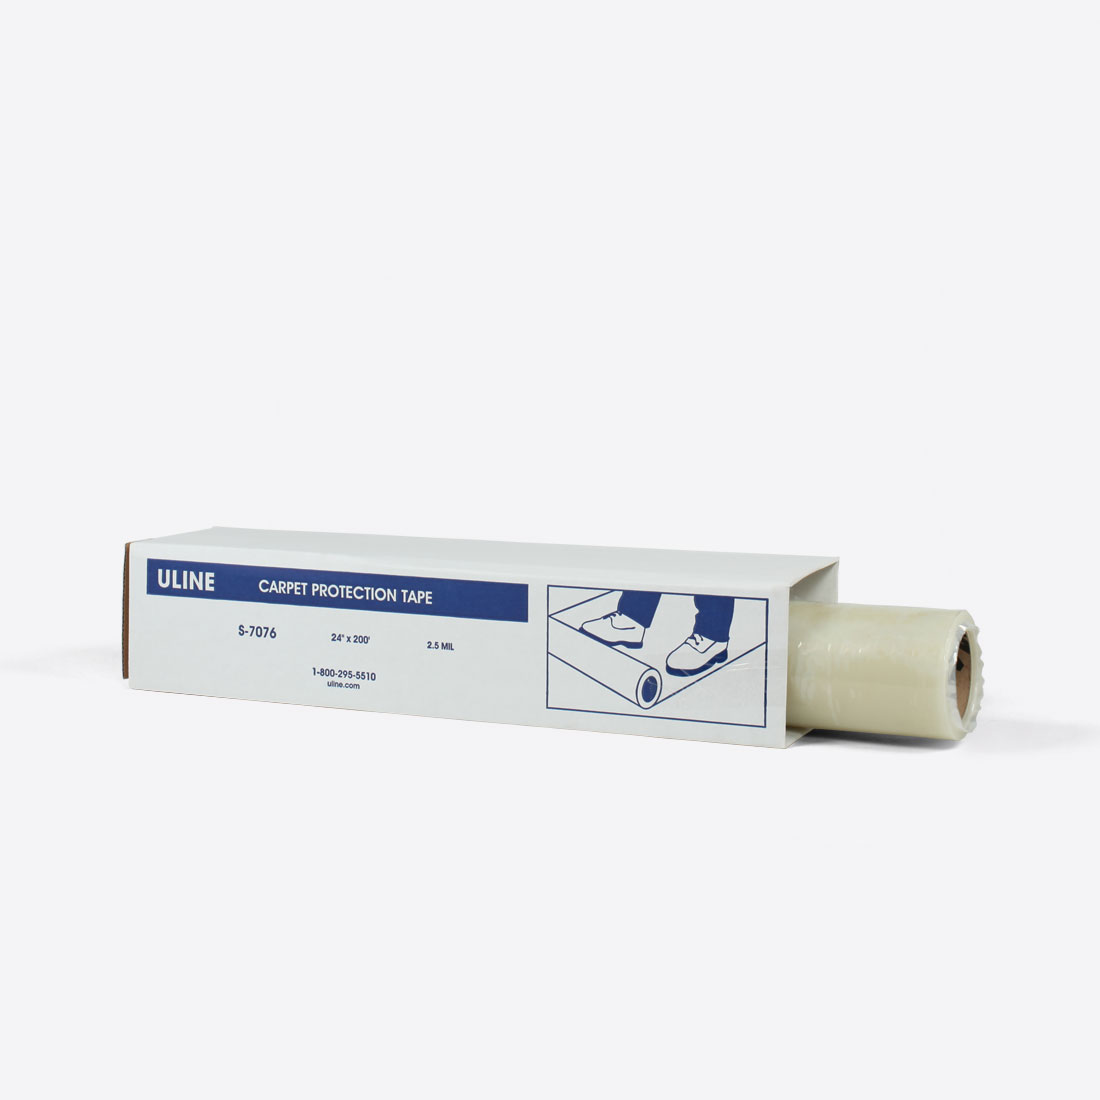 Carpet-Protection-Tape